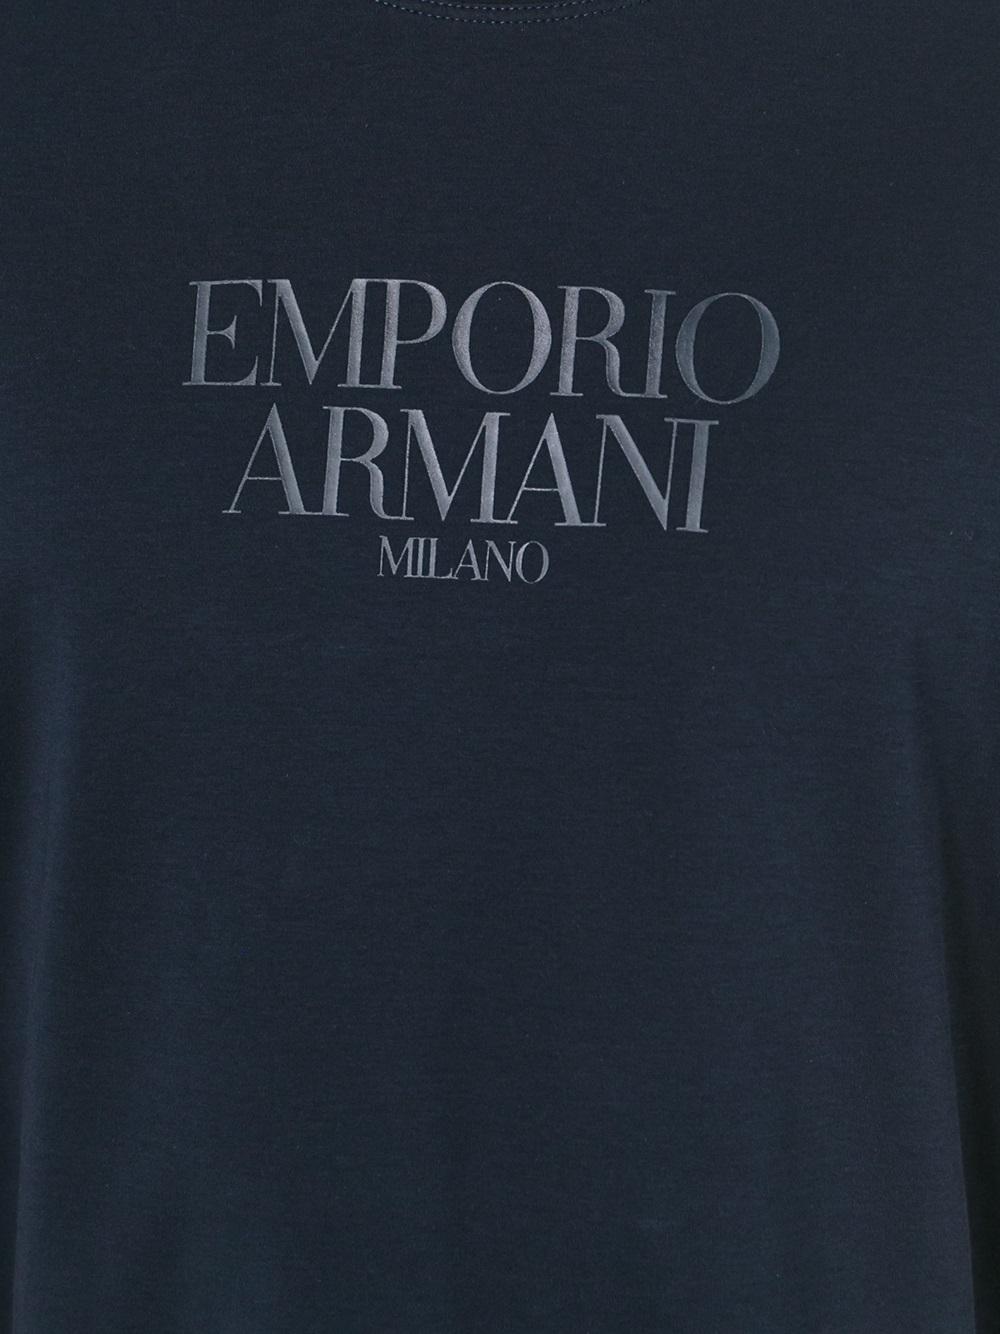 Lyst emporio armani logo print with round neck - Emporio giorgio armani logo ...